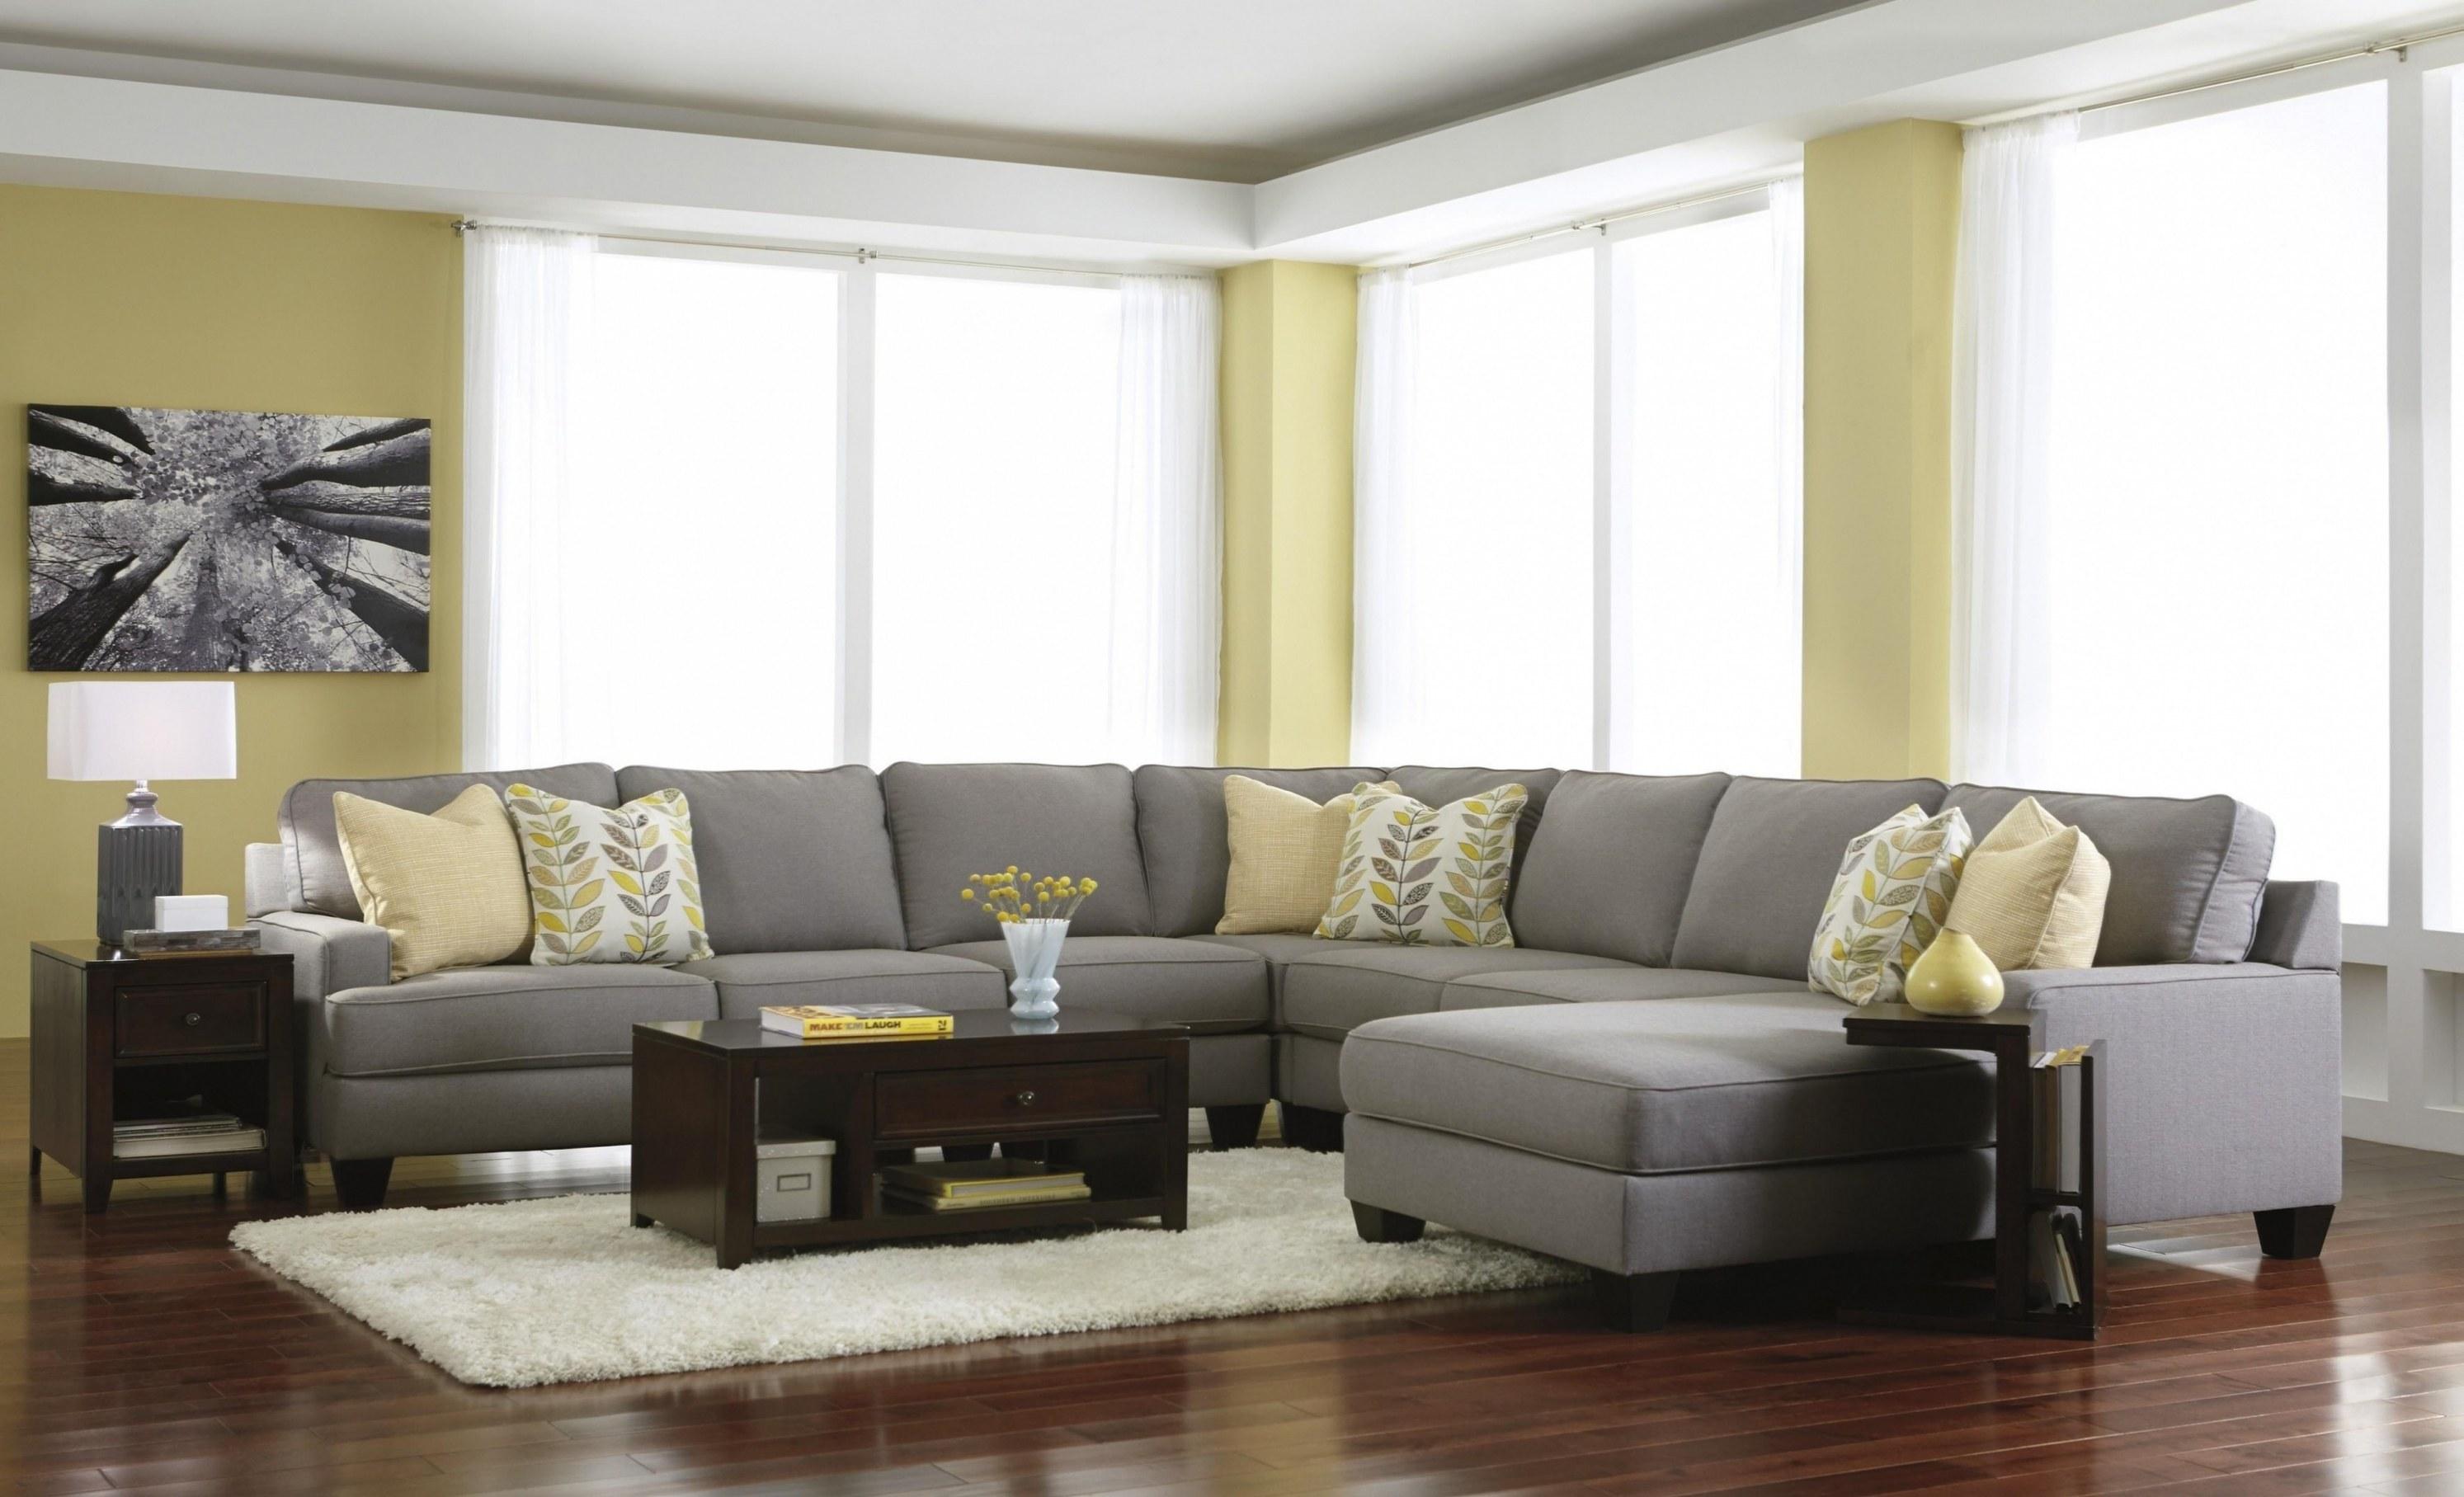 modern fireplace design 88 modern bedroom decorating ideas for couples of modern fireplace design